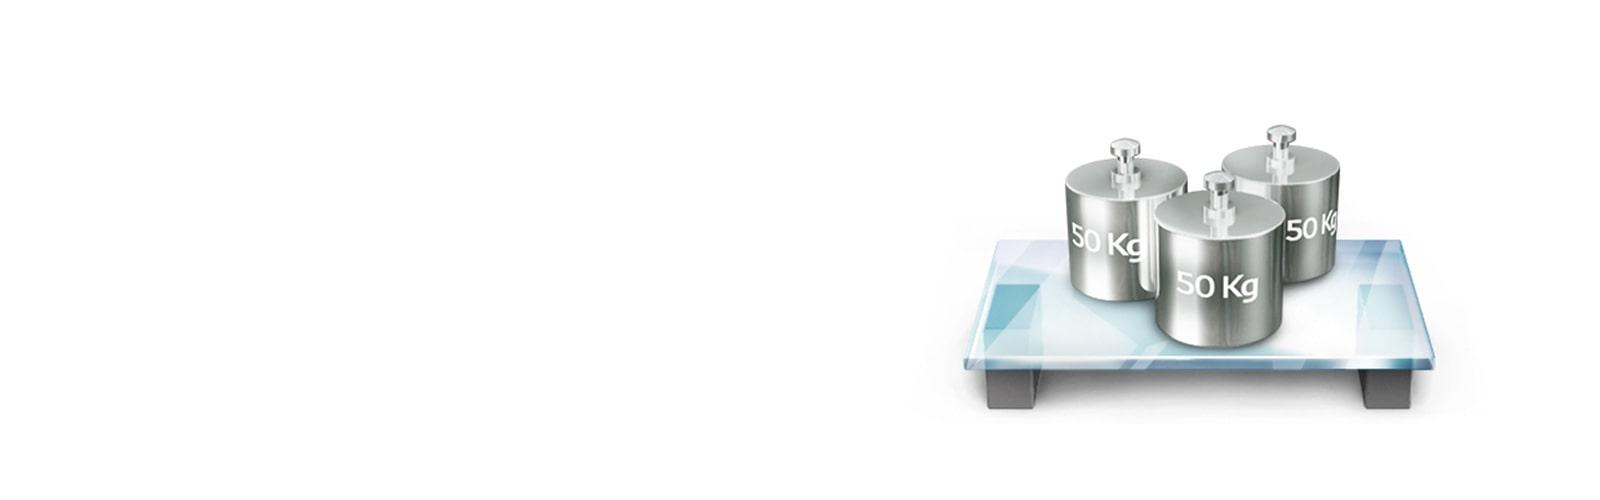 GN-Y331SLB_All_Refrigerators_GLASS-SHELF_D